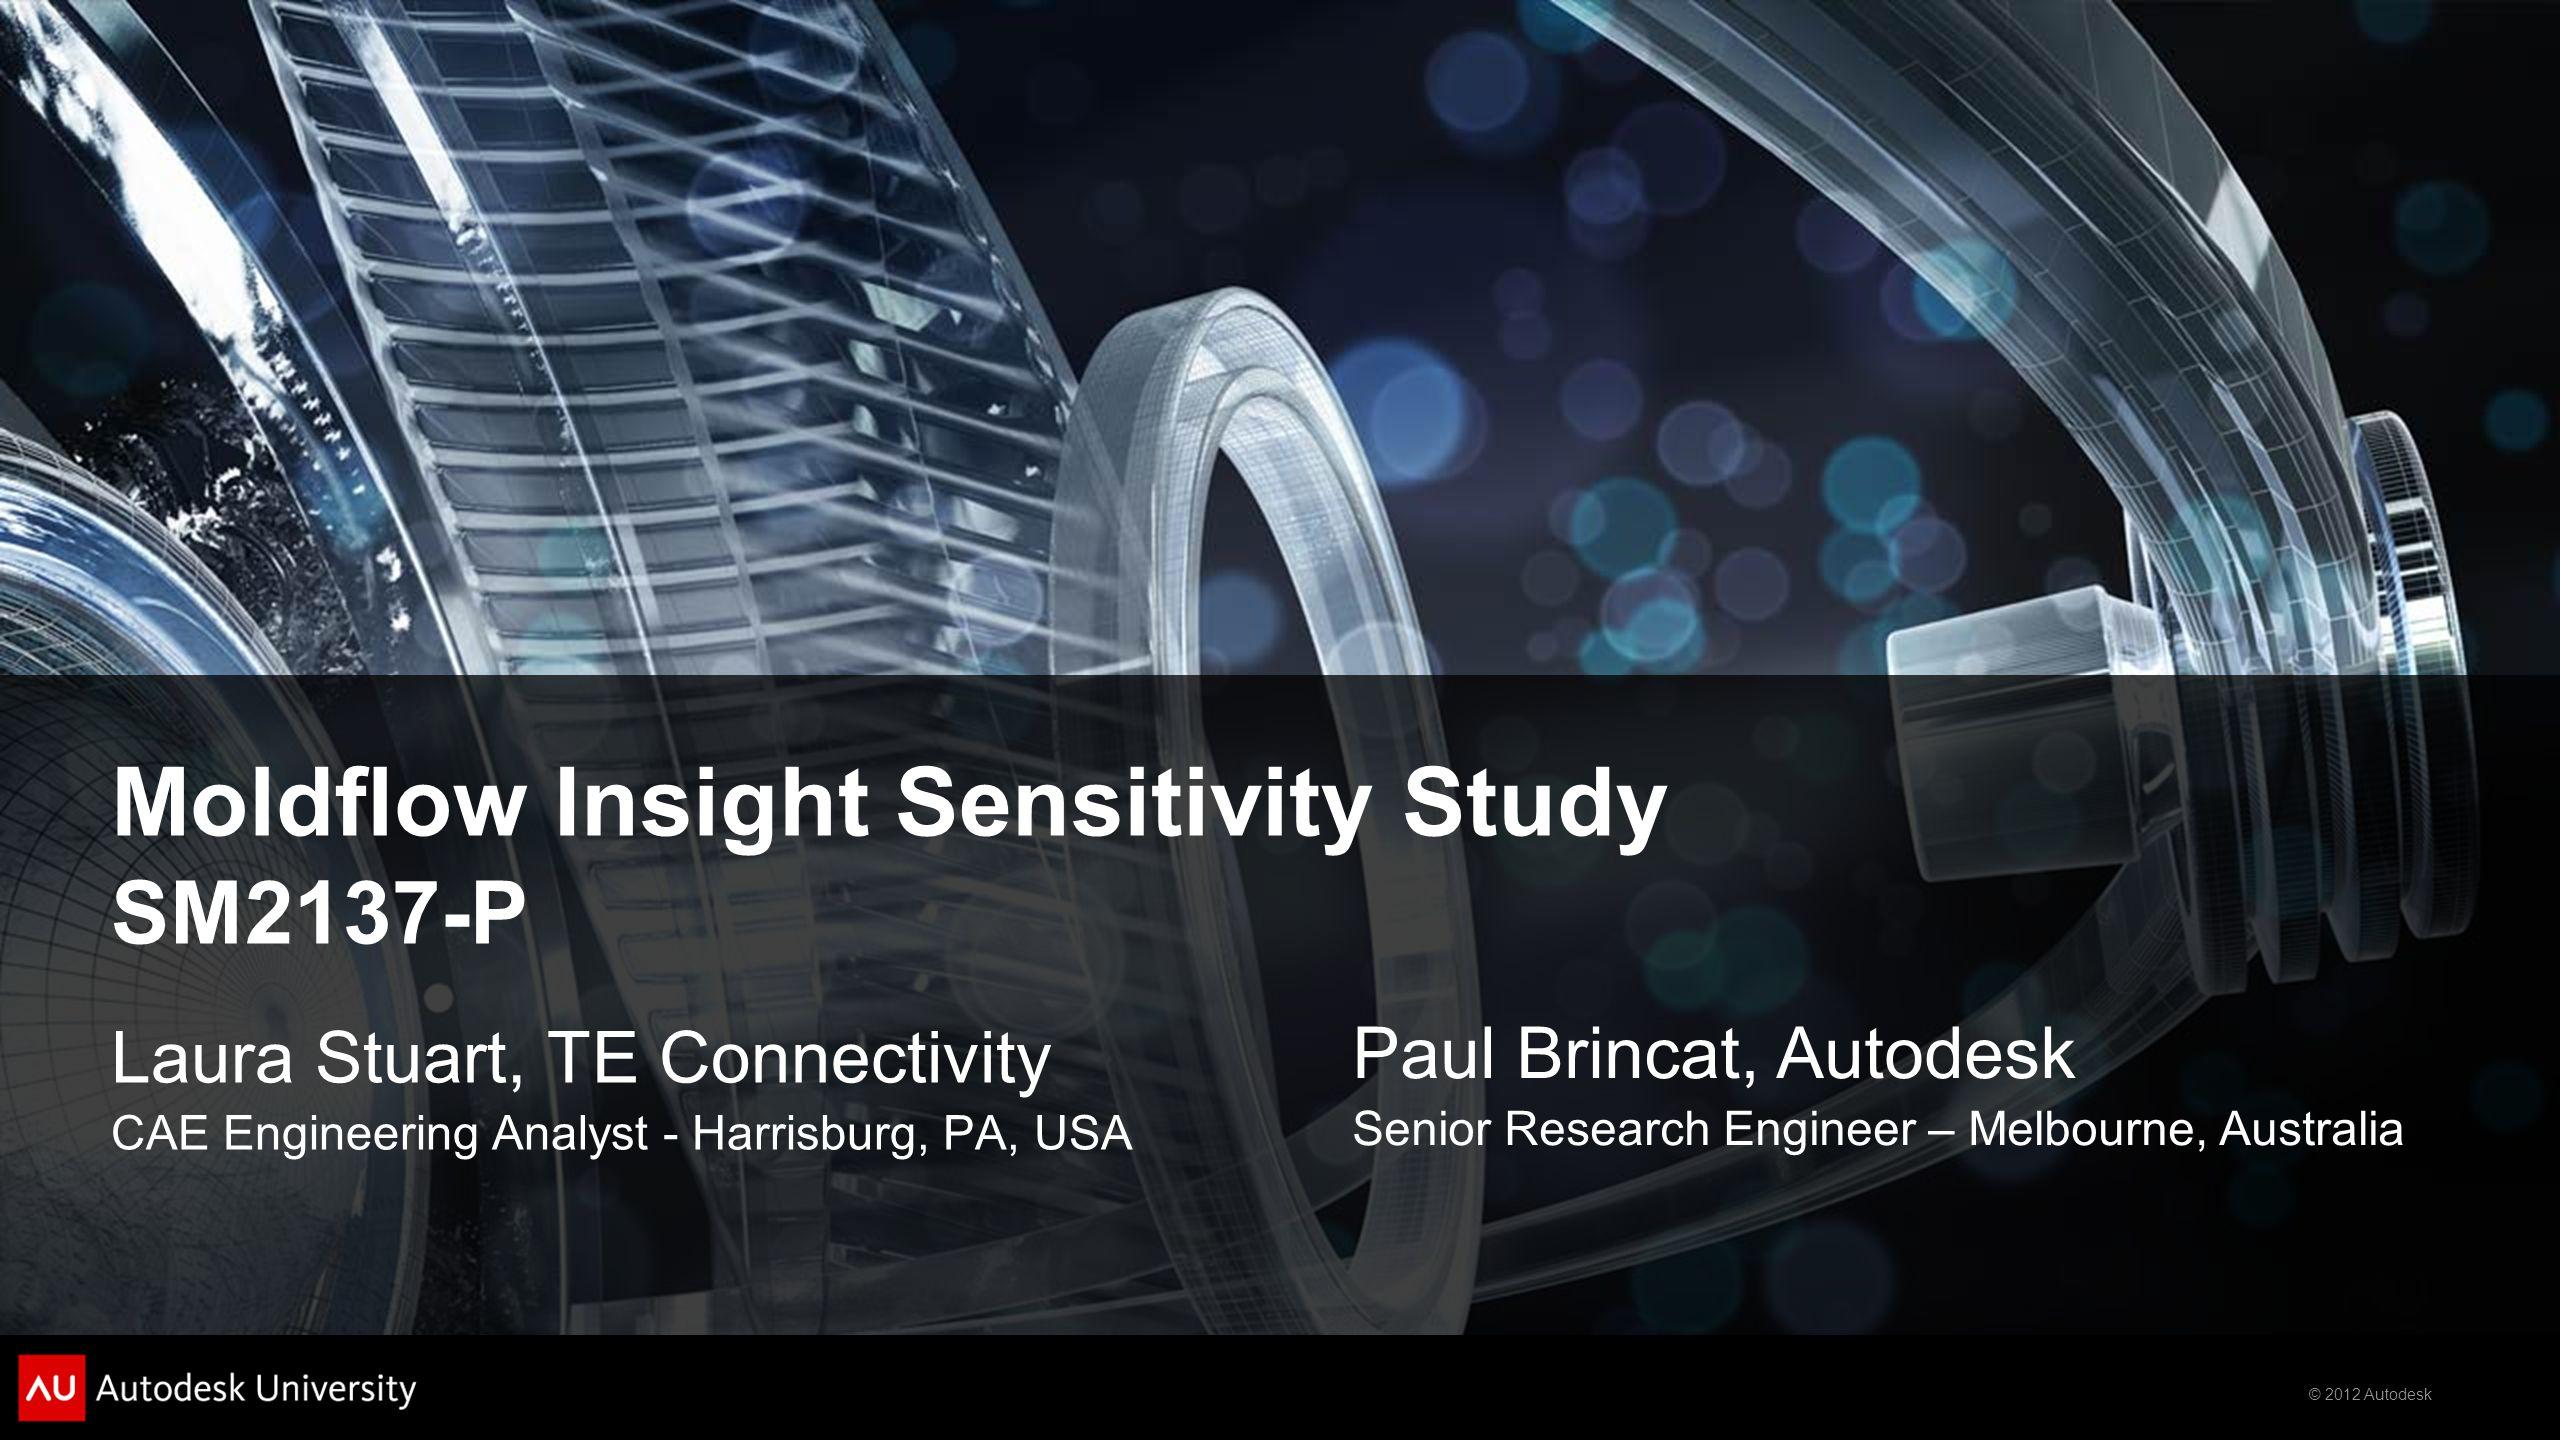 © 2012 Autodesk Moldflow Insight Sensitivity Study SM2137-P Laura Stuart, TE Connectivity CAE Engineering Analyst - Harrisburg, PA, USA Paul Brincat,